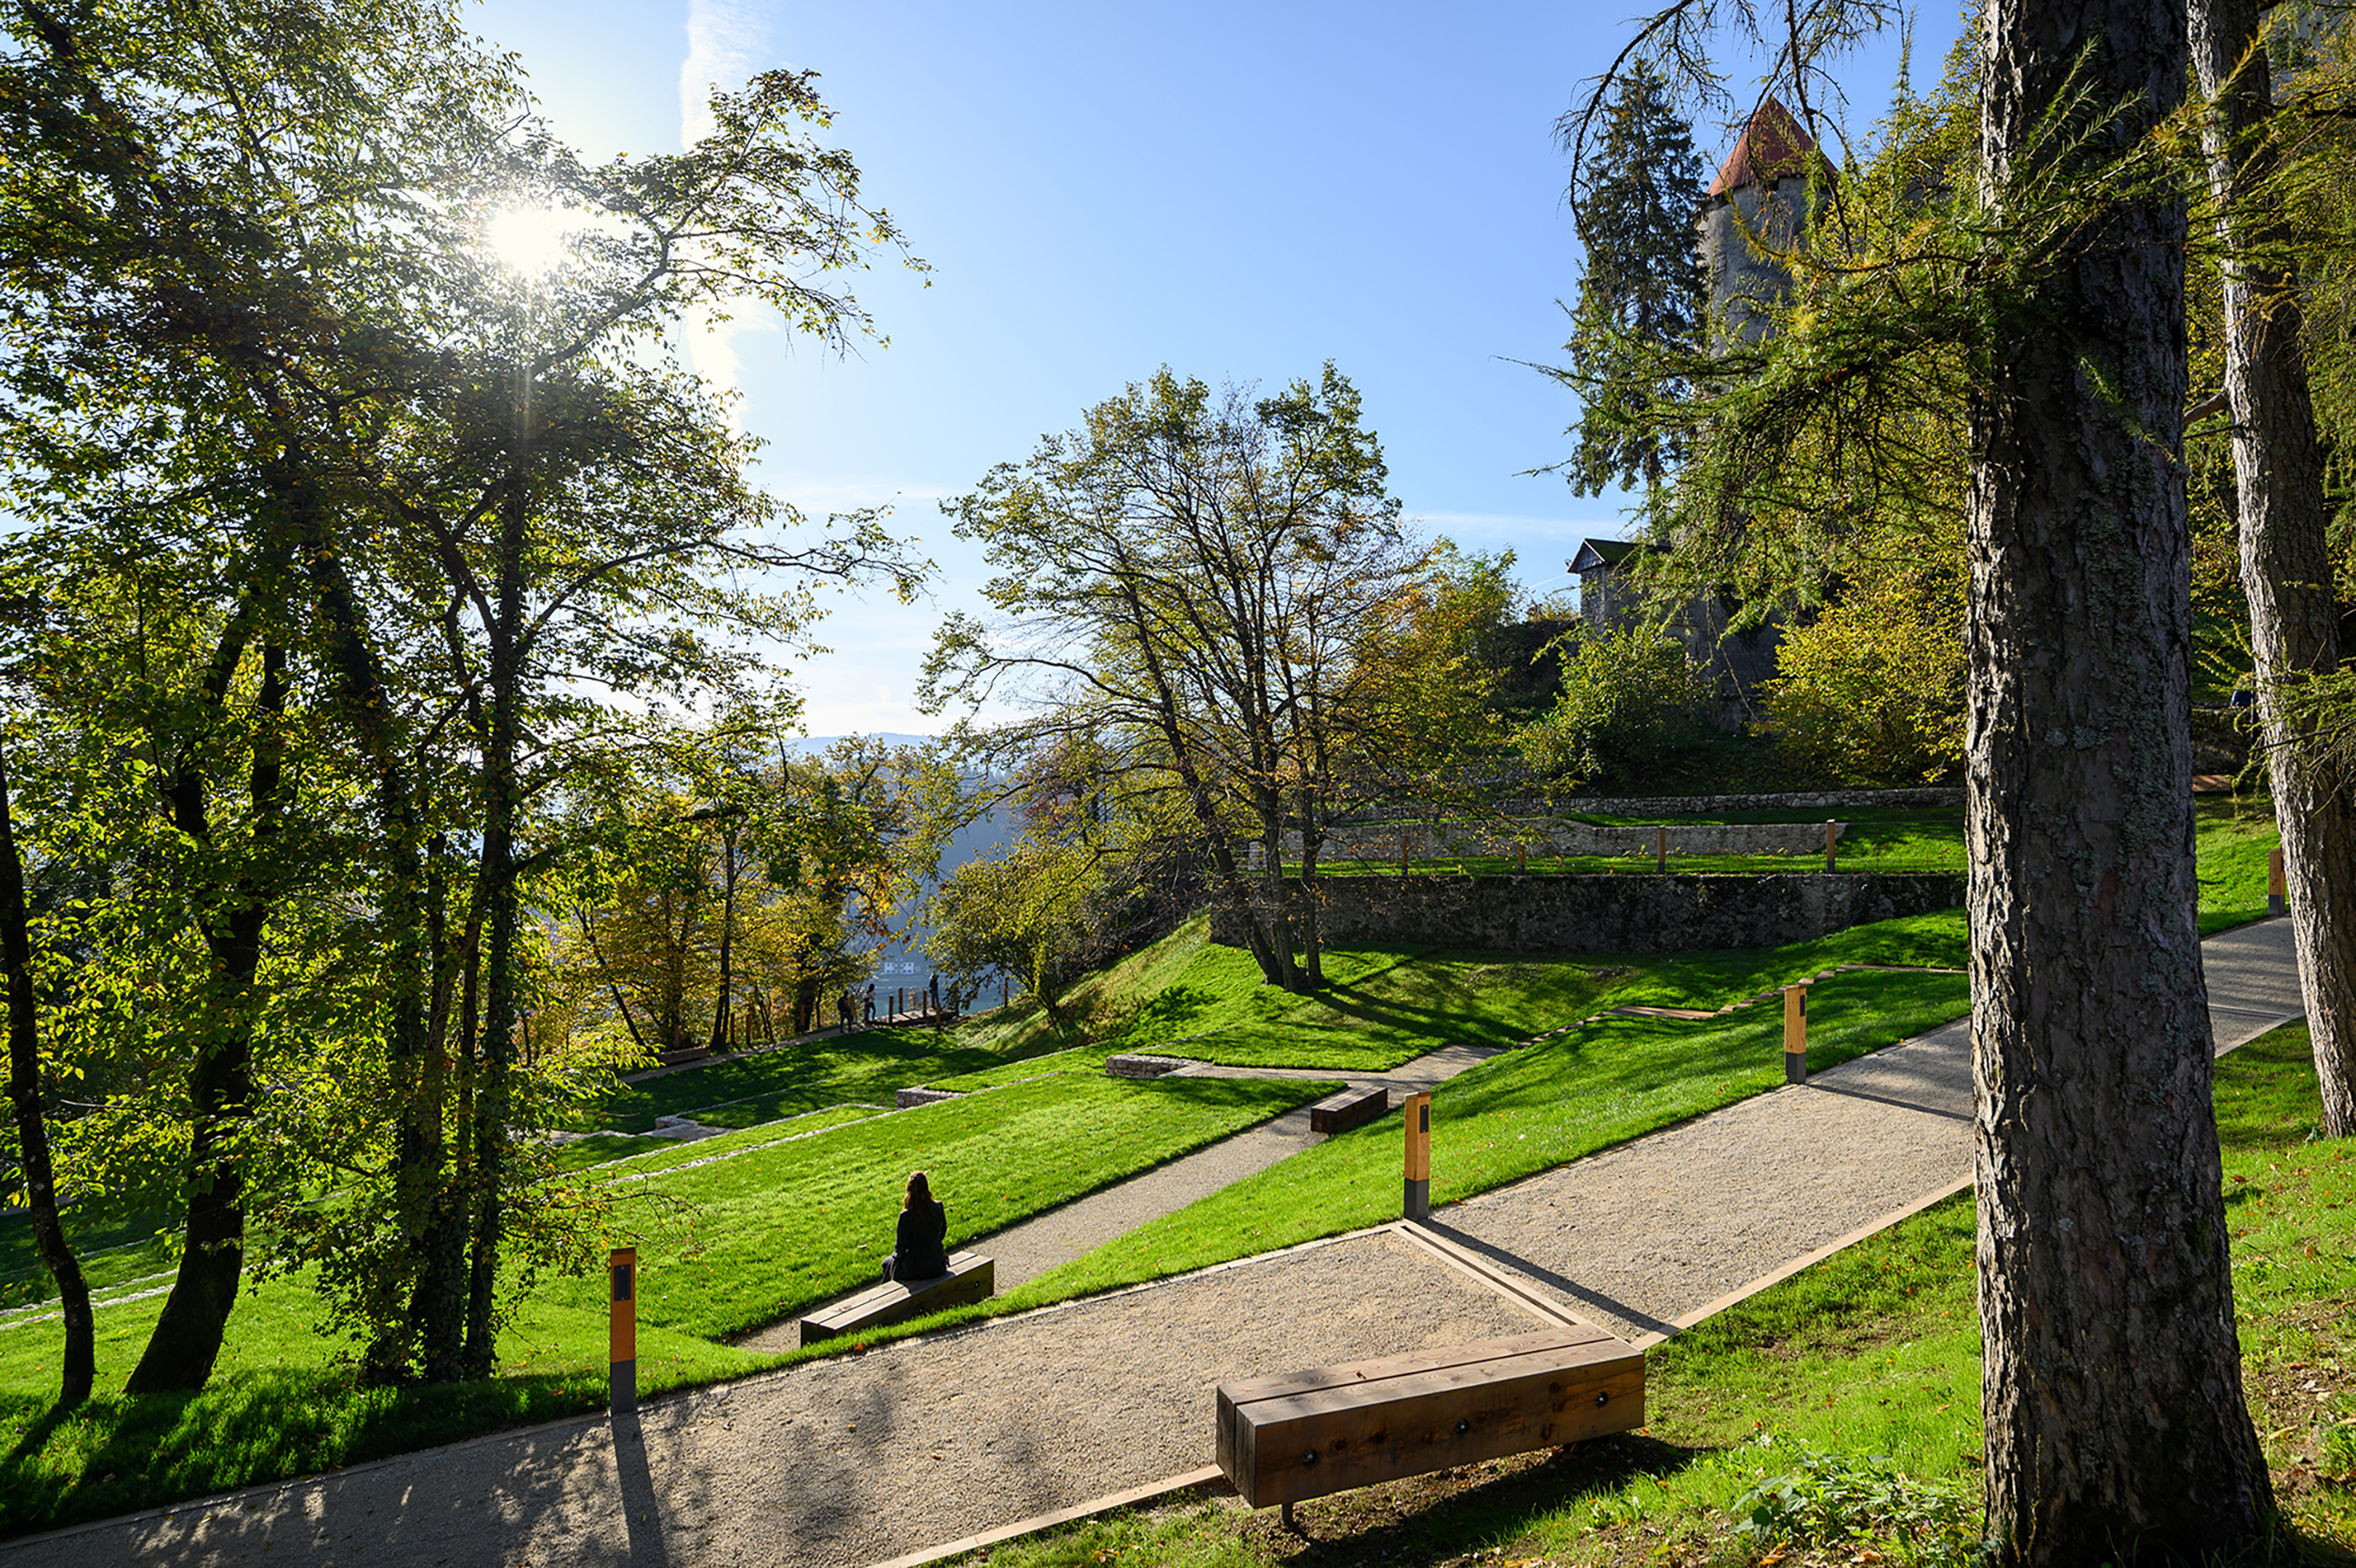 bruto bled grad jezero lake castle grajski park